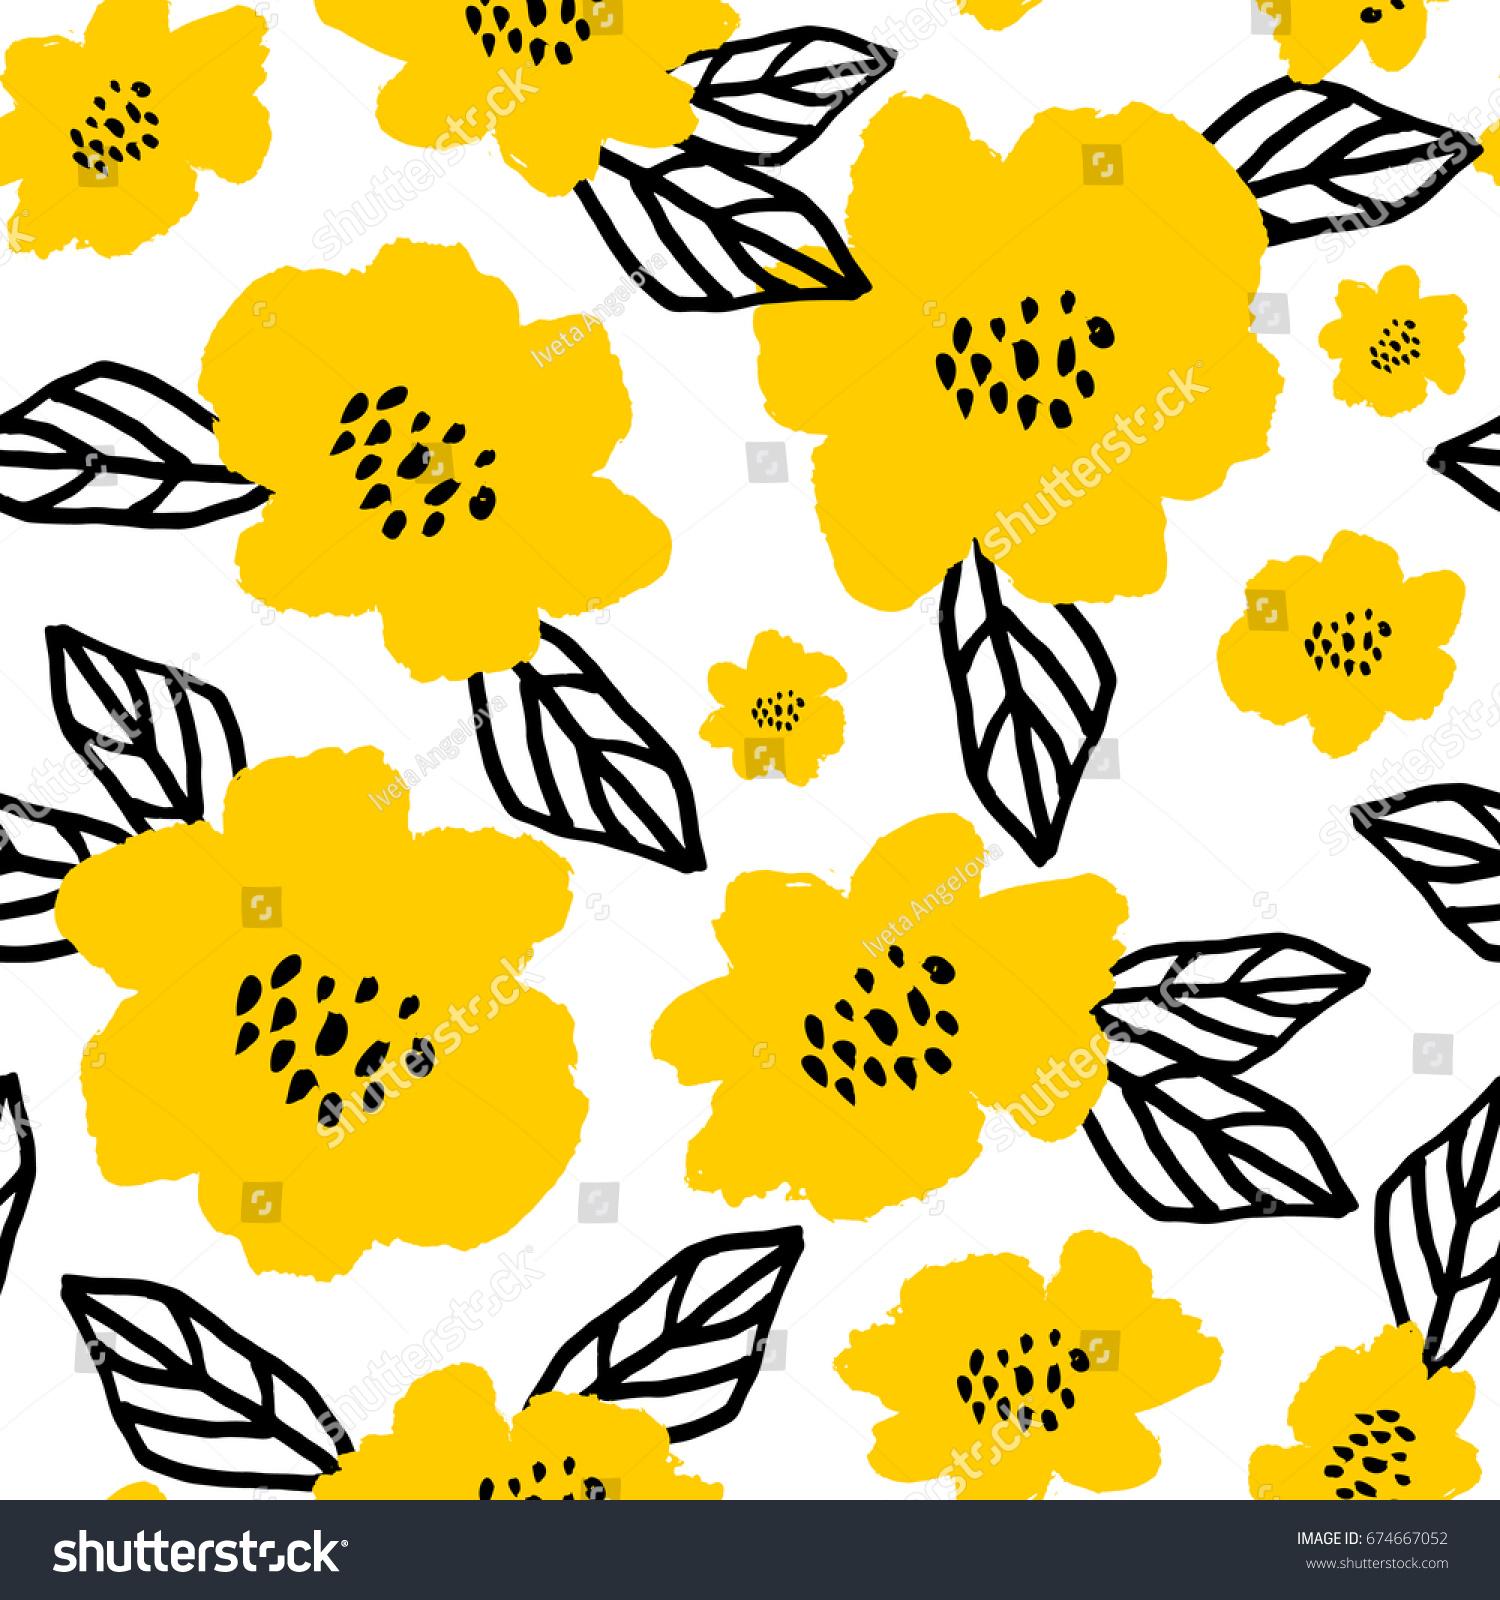 Seamless Repeat Pattern Flowers Leaves Black Stock Vector 674667052 ...